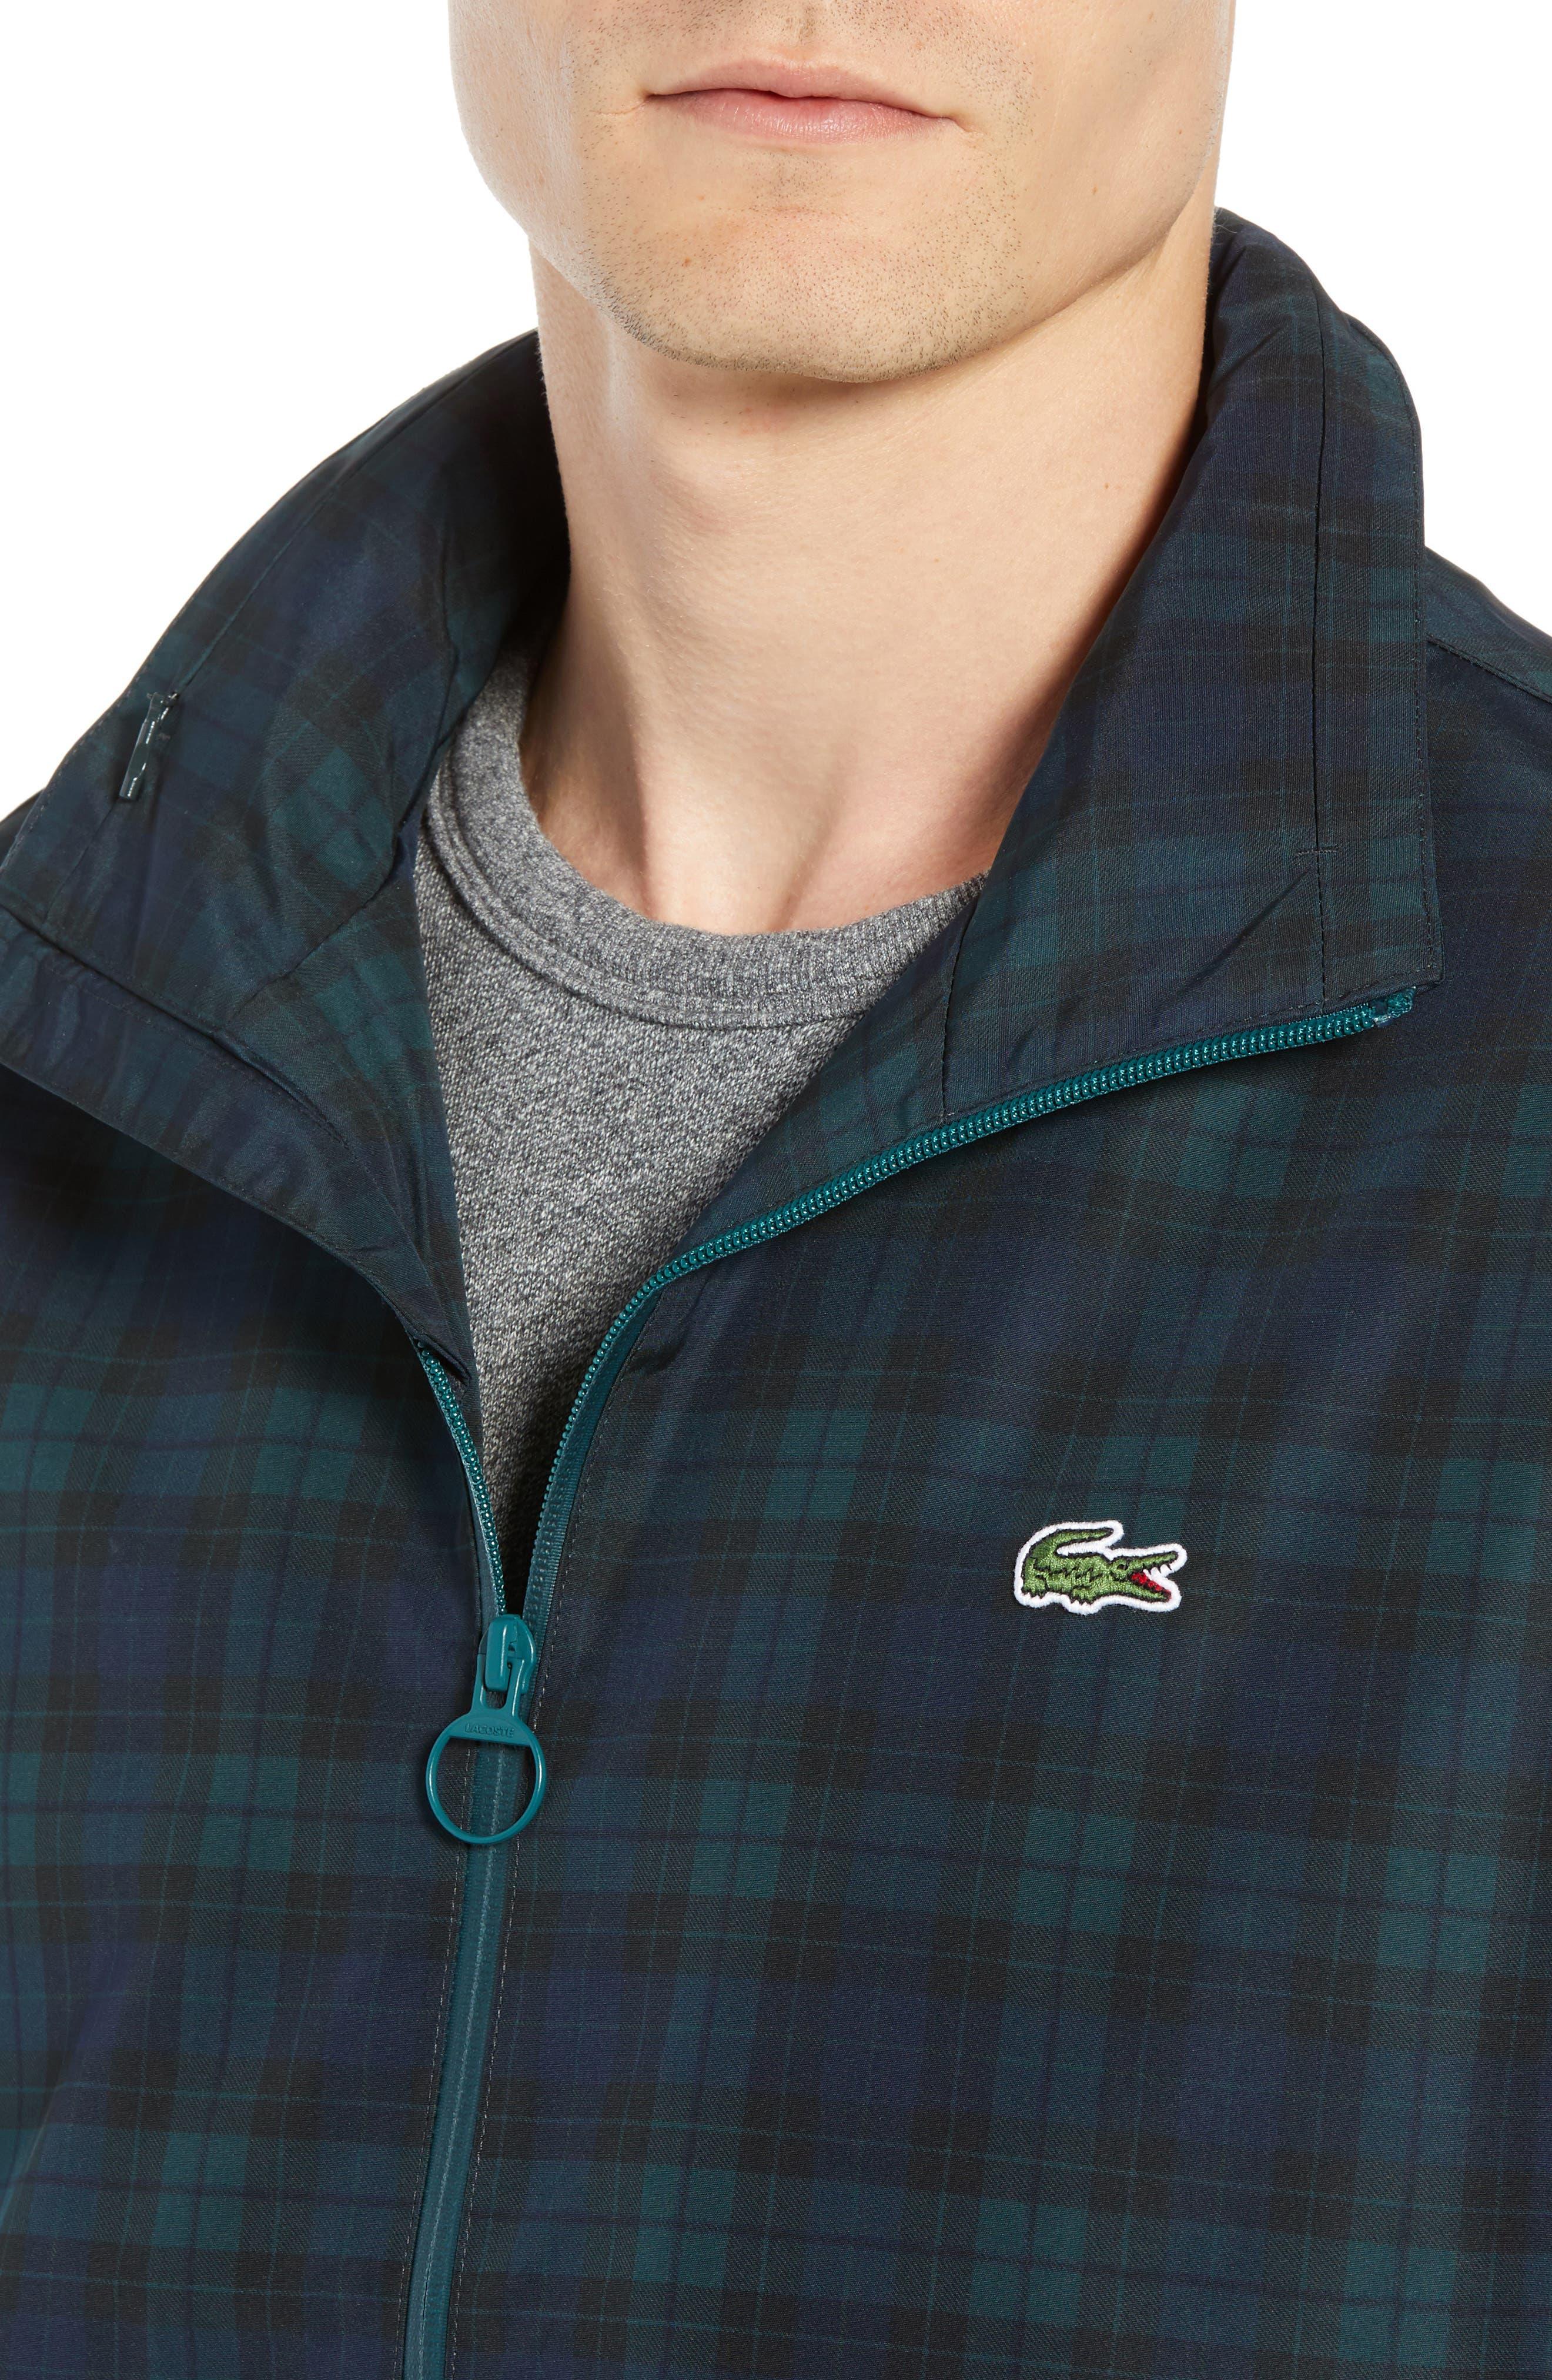 Regular Fit Check Windbreaker Jacket,                             Alternate thumbnail 4, color,                             NAVY BLUE/ SINOPLE BLACK